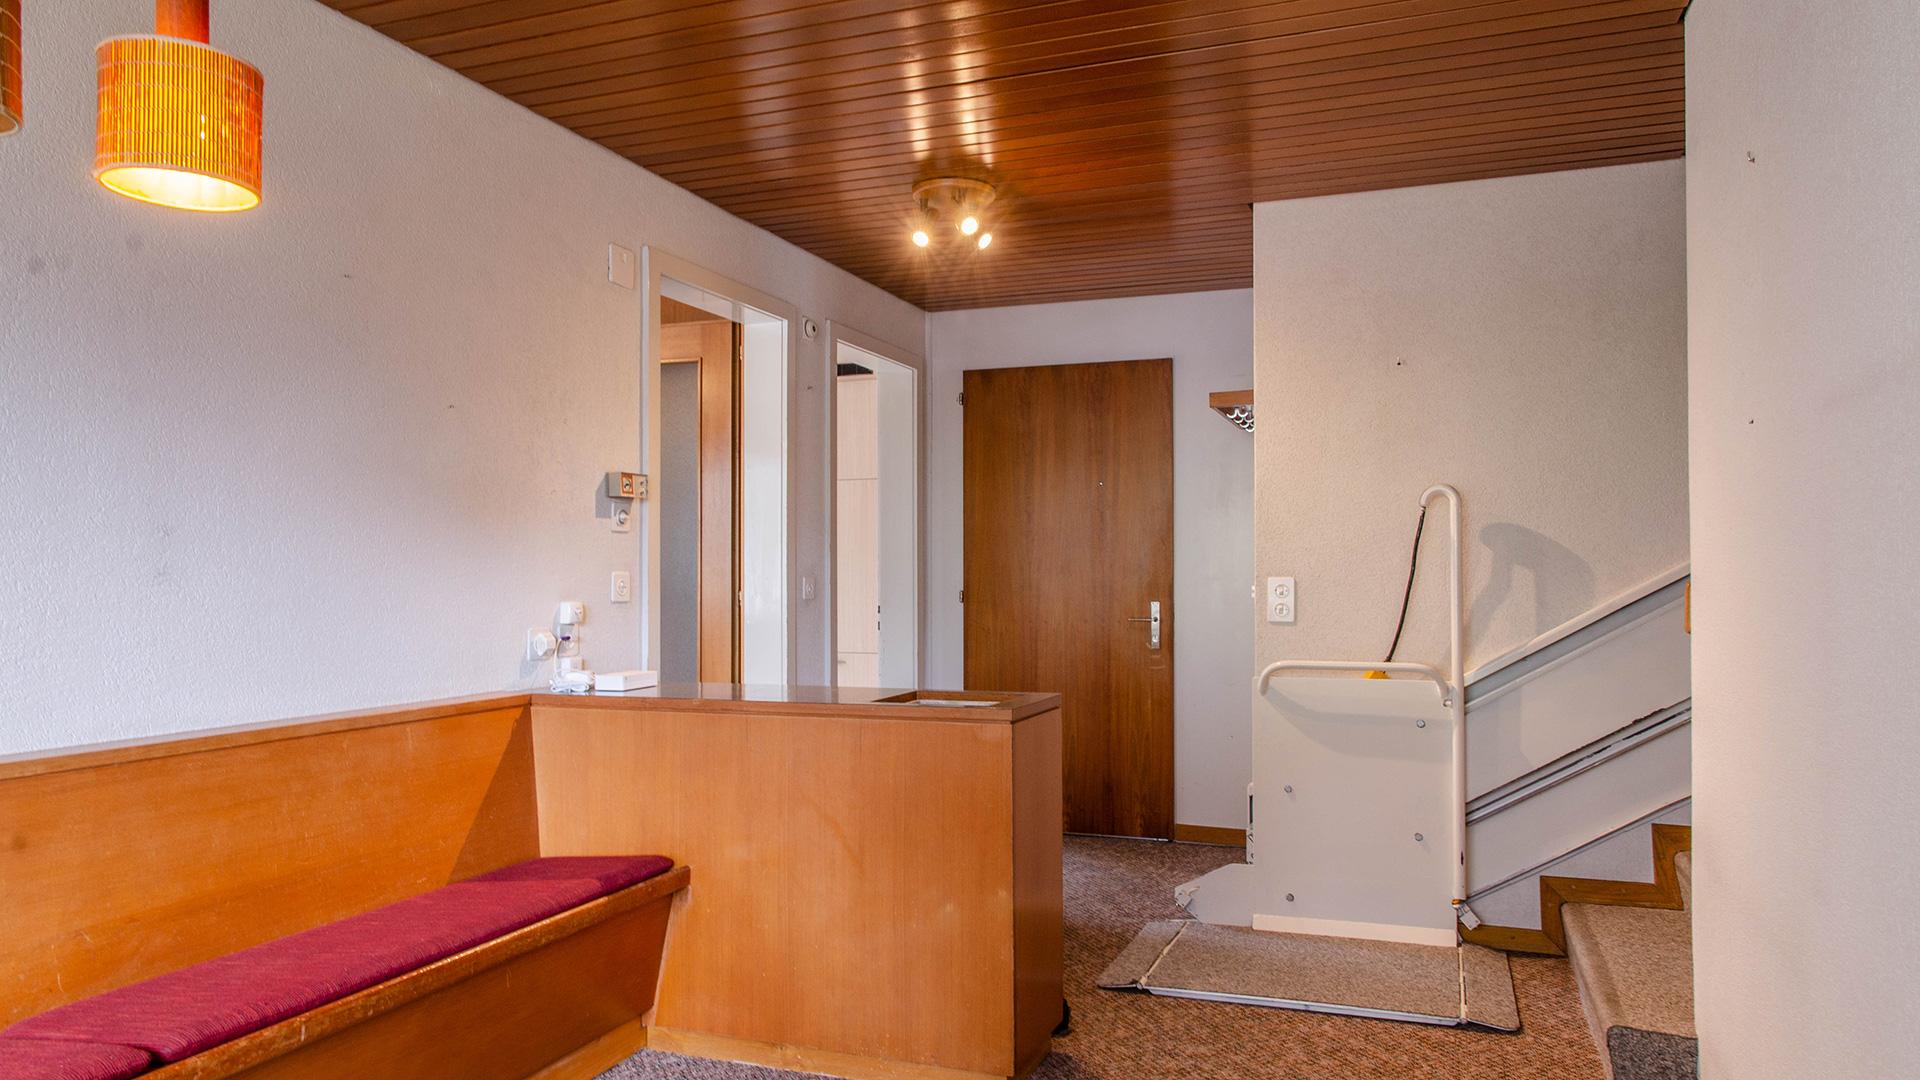 Birkenhaus Apartments, Switzerland